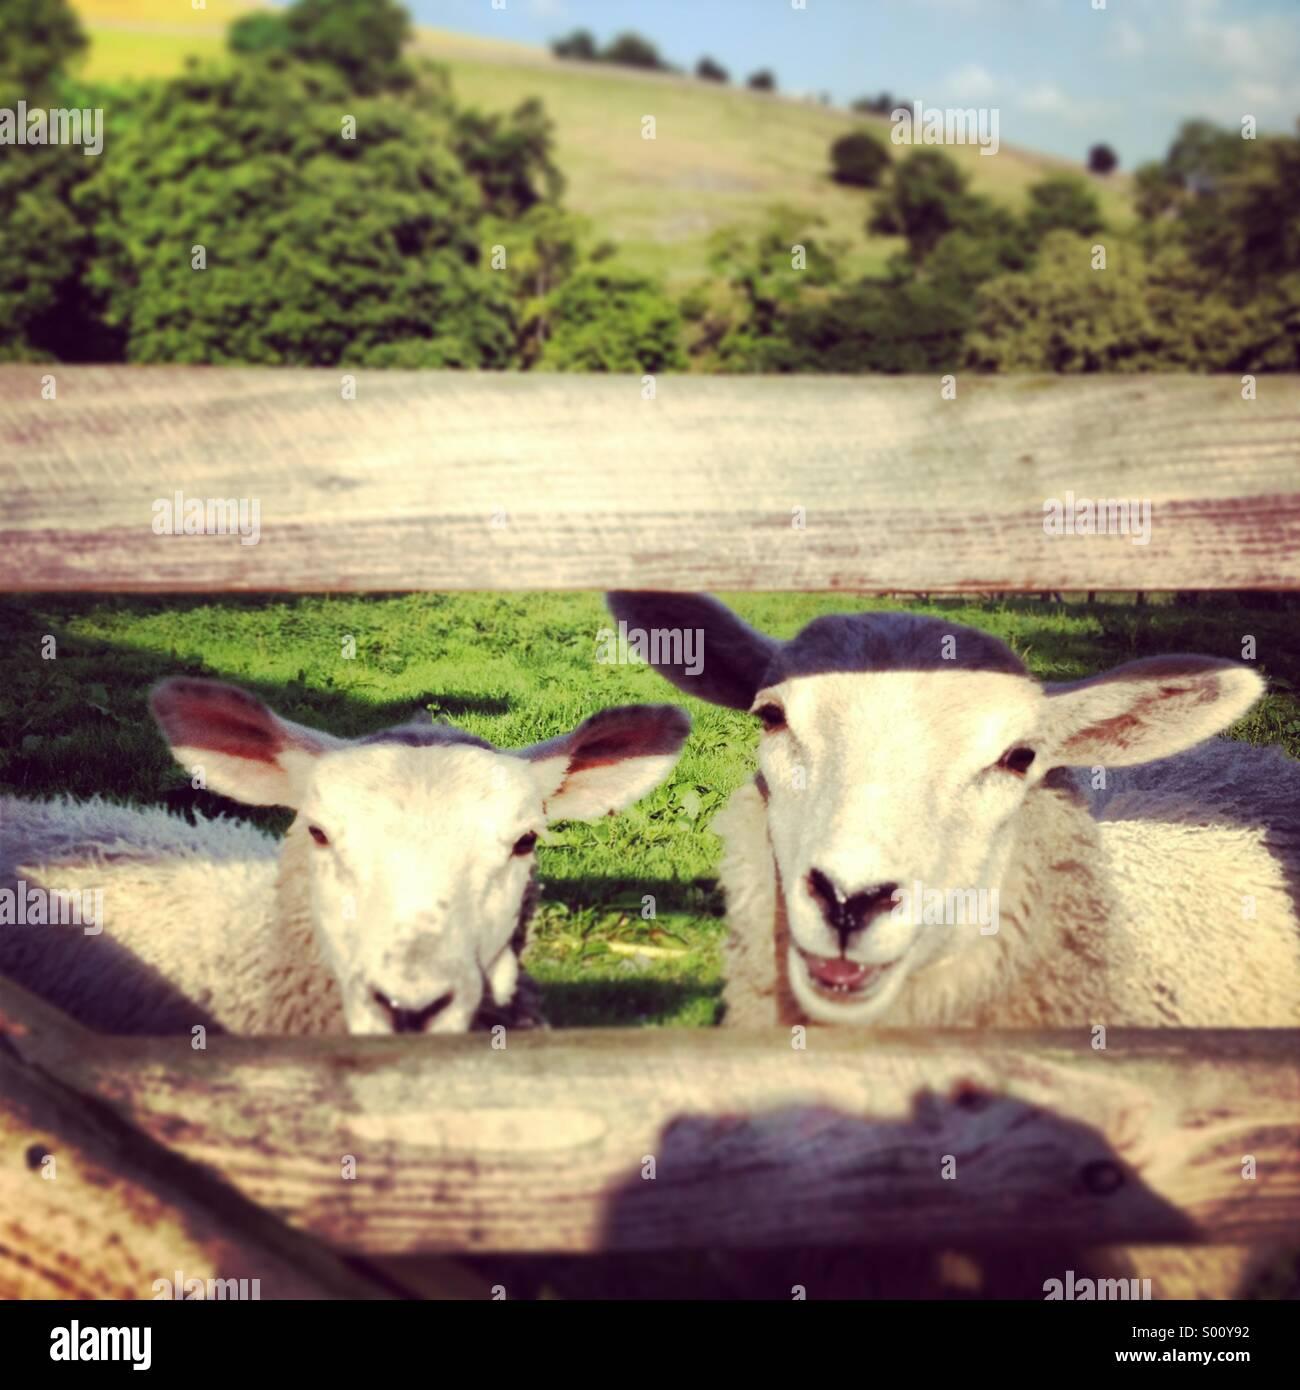 Sheep through fence - Stock Image